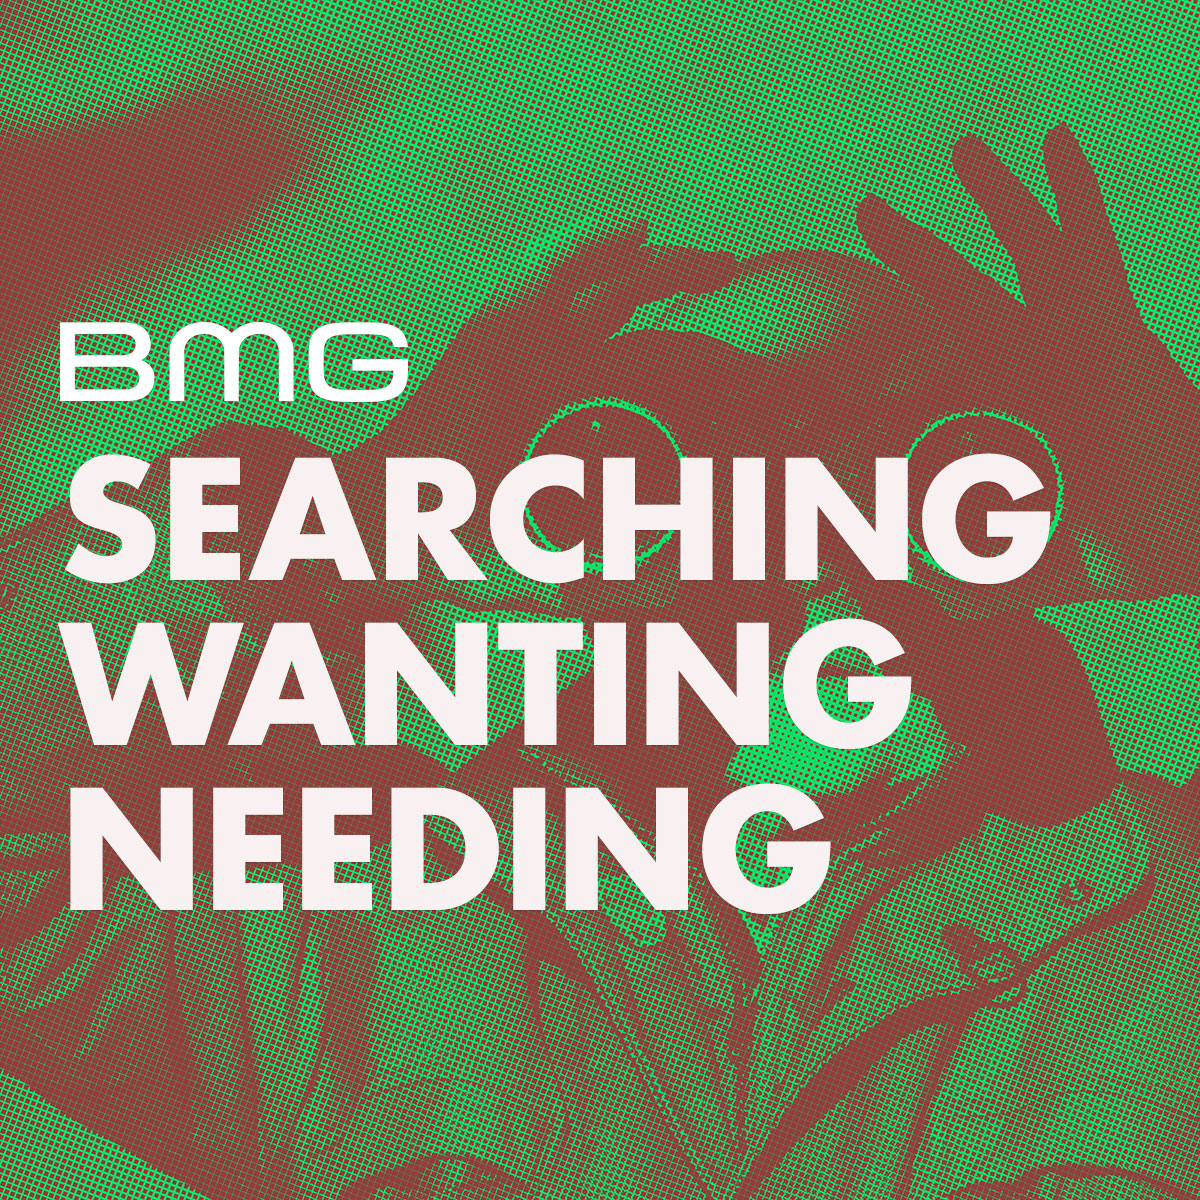 1200-x-1200-Searching-Wanting-Needing.jpg